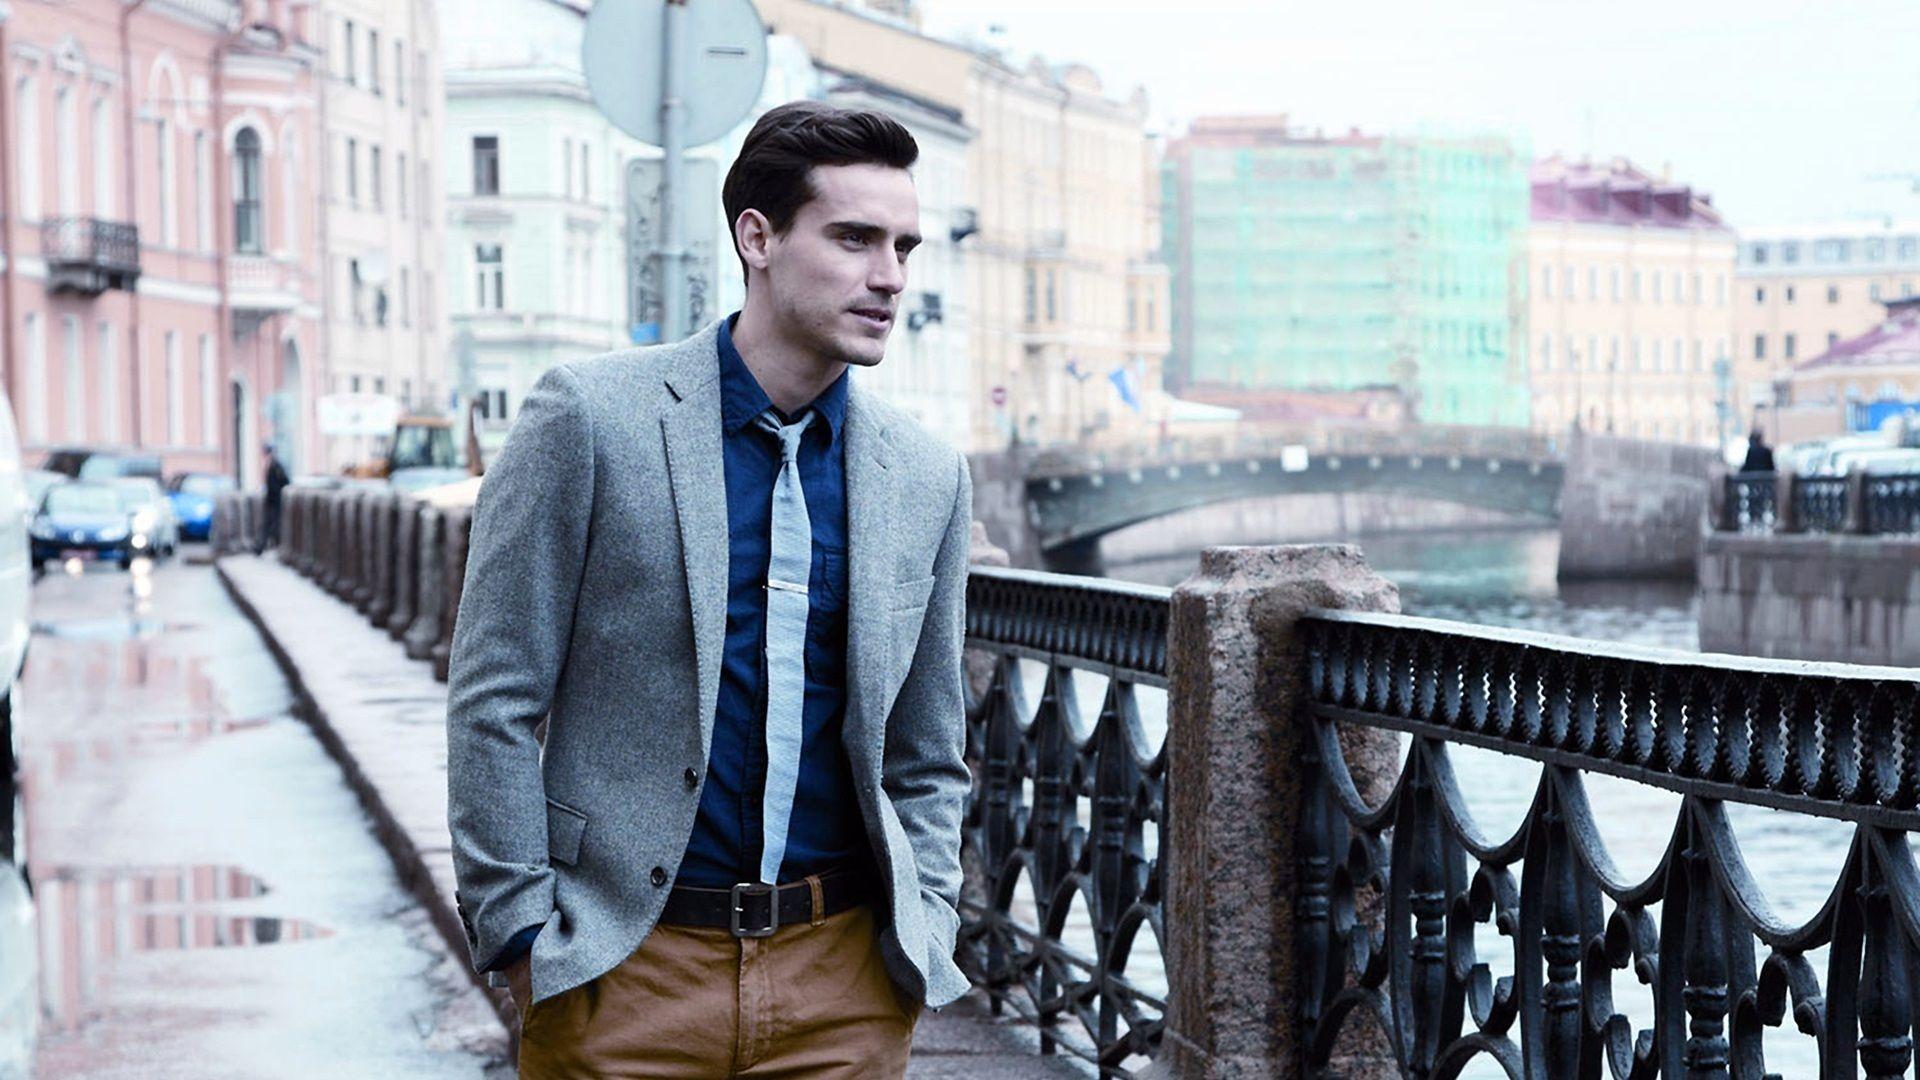 Men Fashion Background | http://bestwallpaperhd.com/men-fashion ...